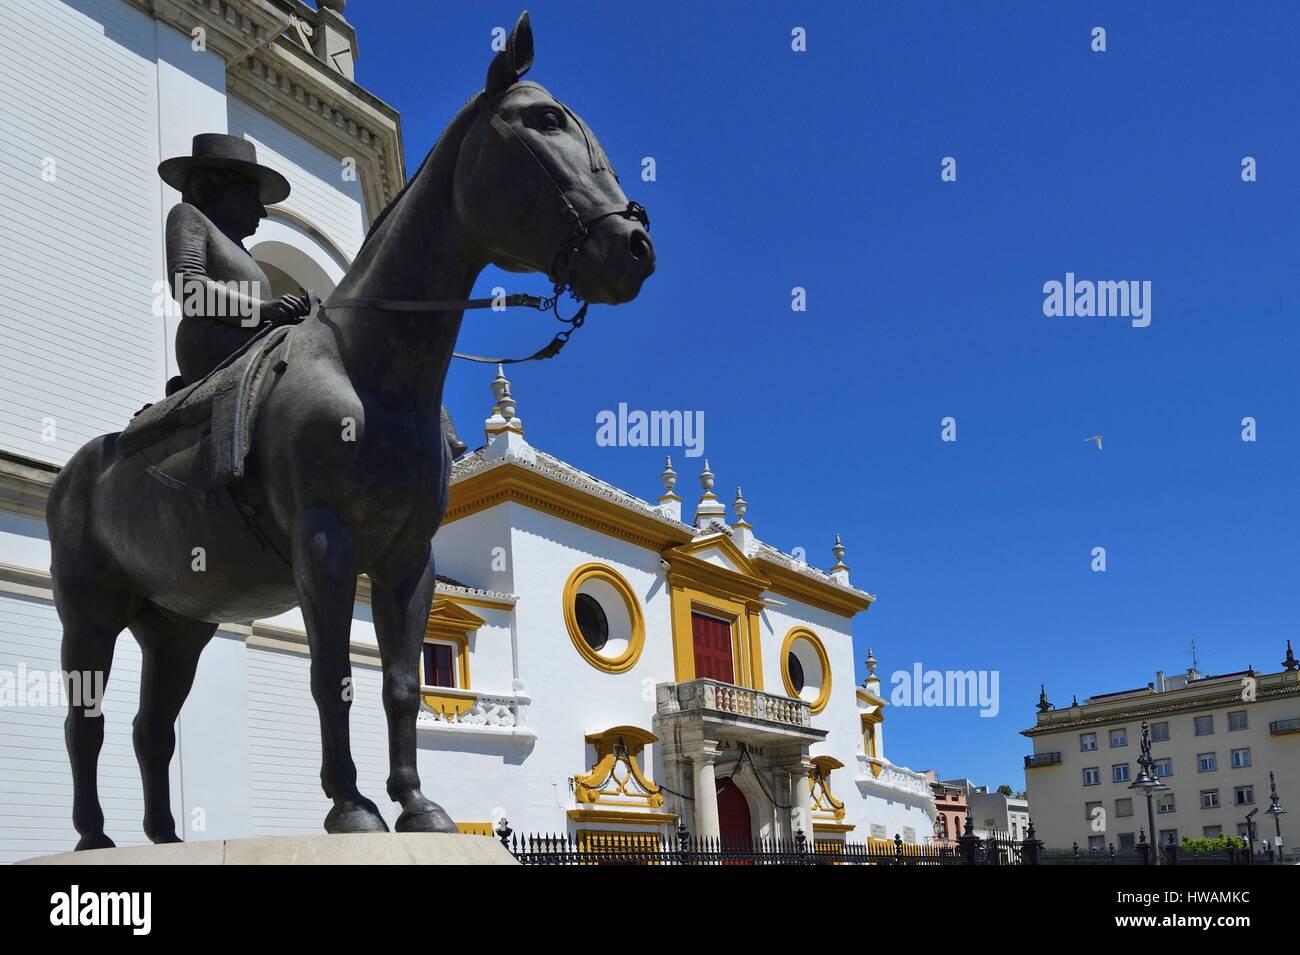 Spain, Andalusia, Seville (Sevilla), Plaza de Toros de la Real Maestranza de Caballeria, bullring - Stock Image